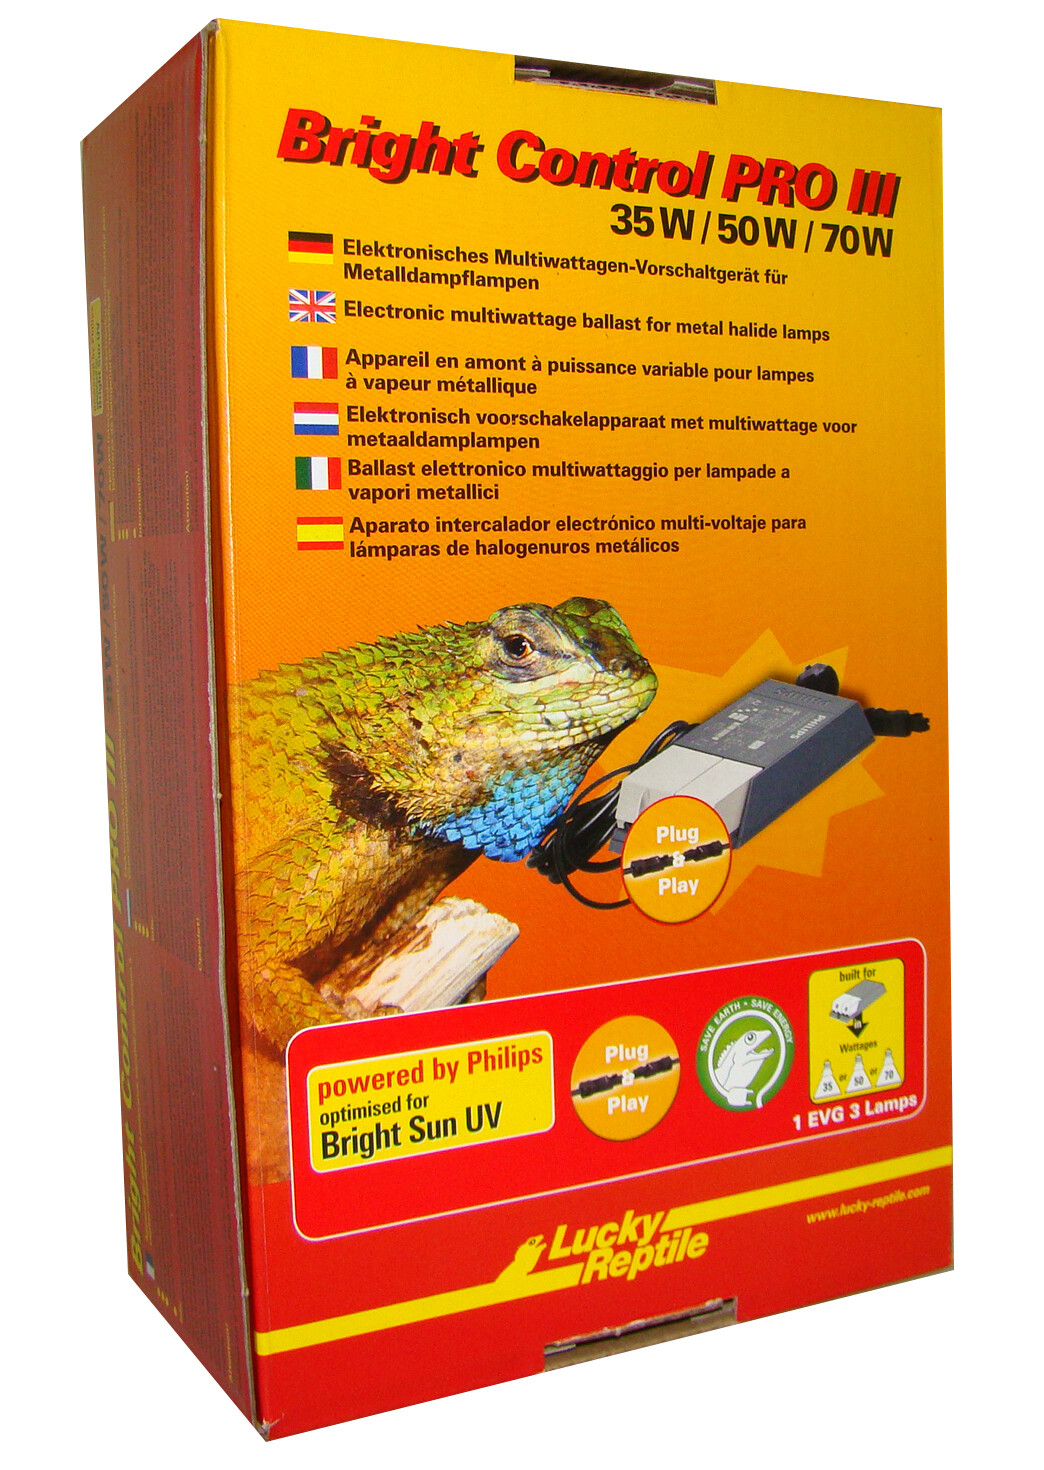 Lucky Reptile Bright Control PRO III 35/50/70 Watt